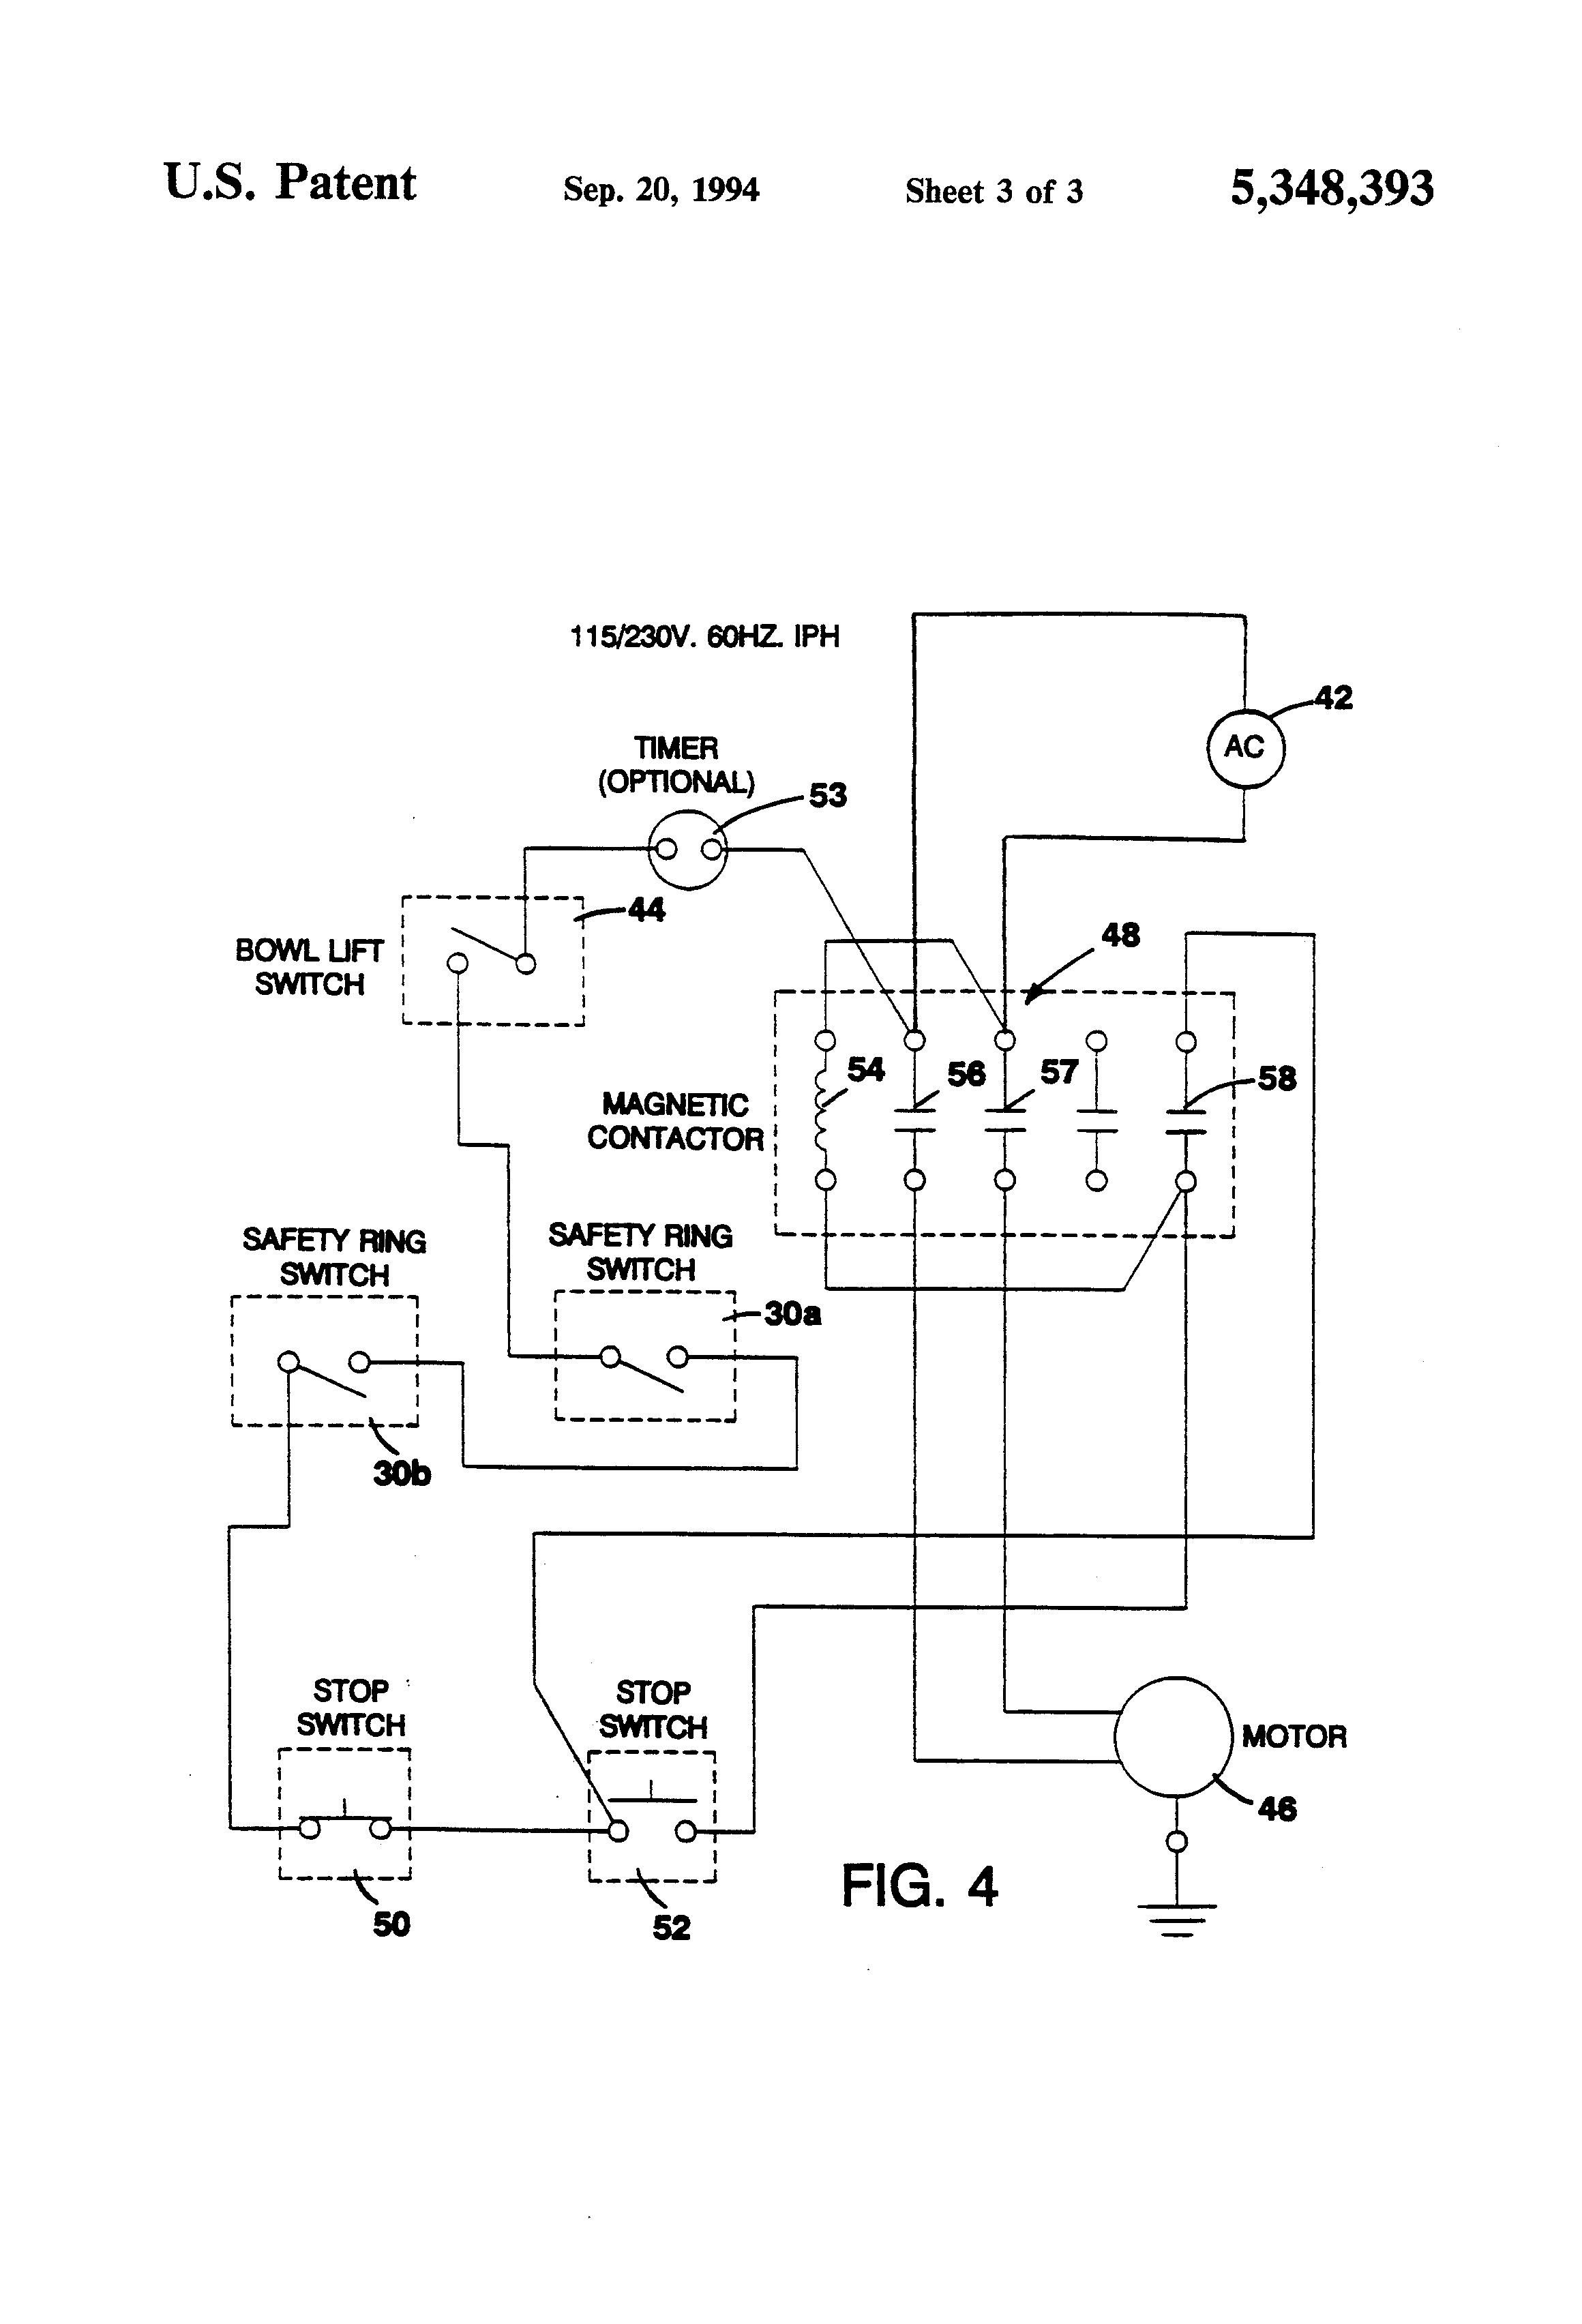 Hobart Rc 250 Wiring Diagram Library Diagrams Mesmerizing Old Mixer Single Phase Motor